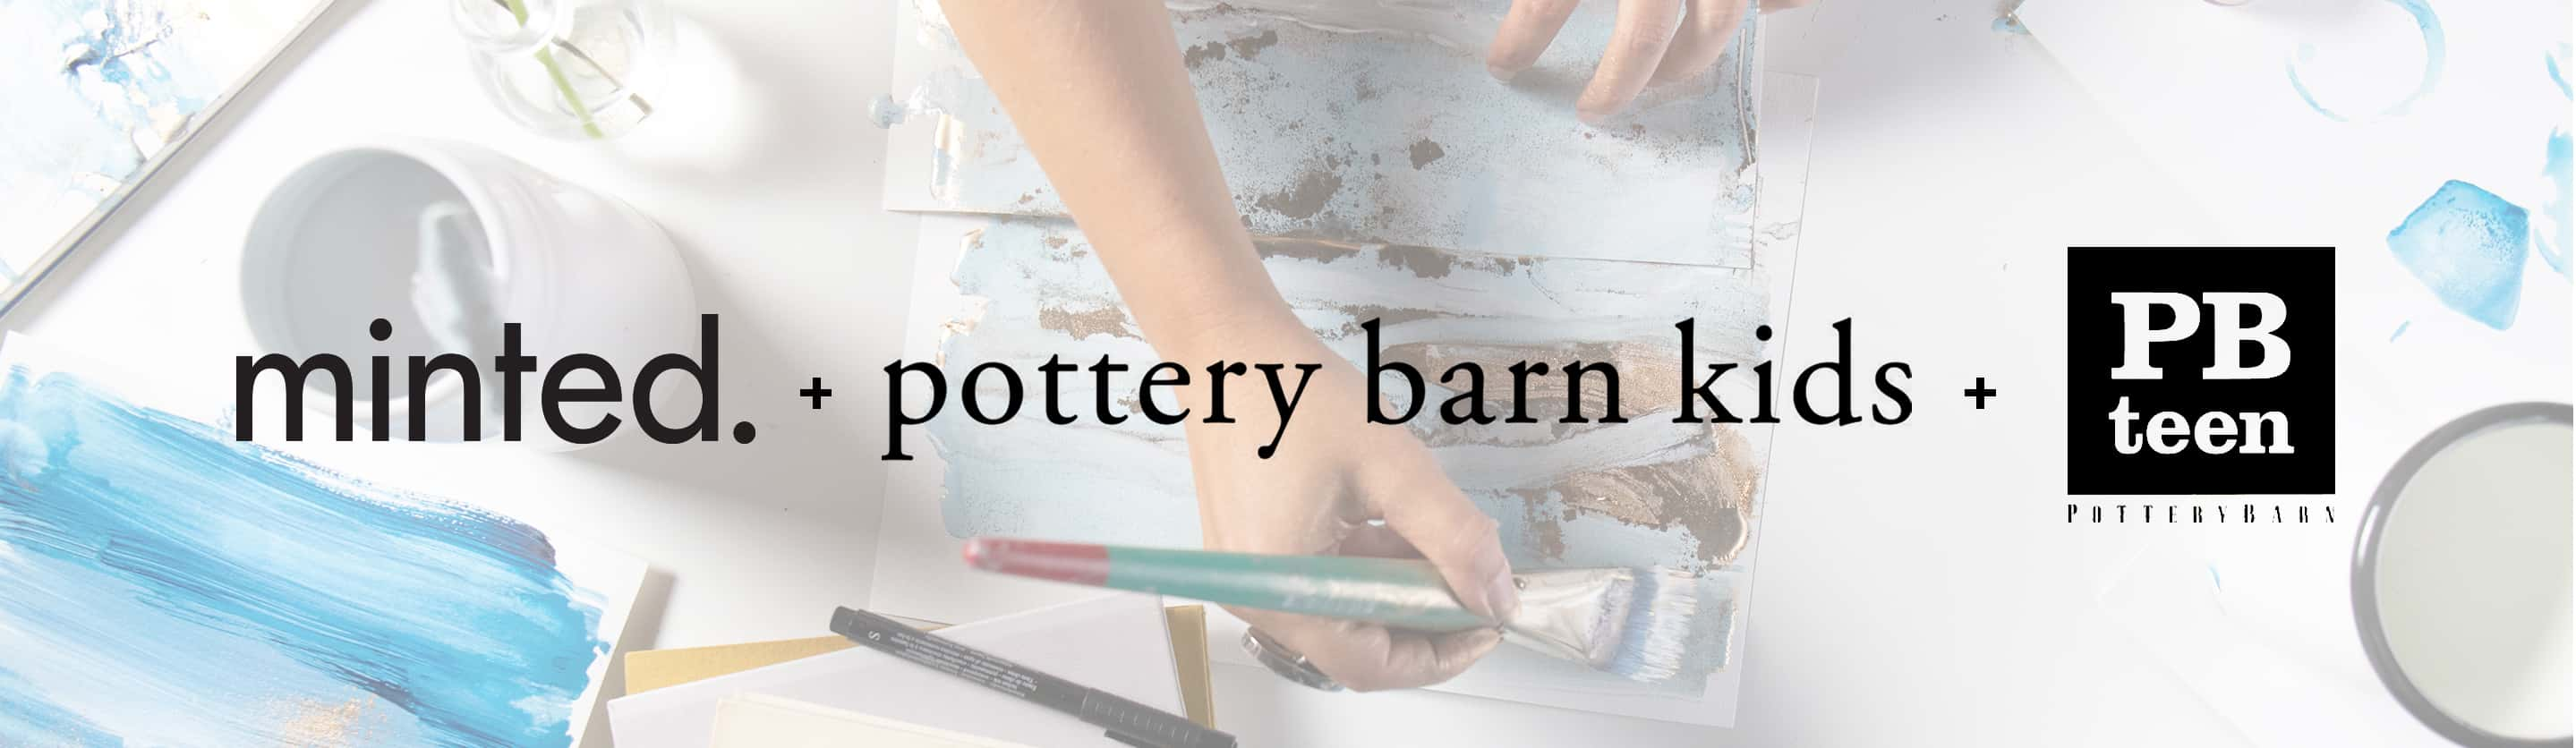 minted. + pottery barn kids + PBTeen